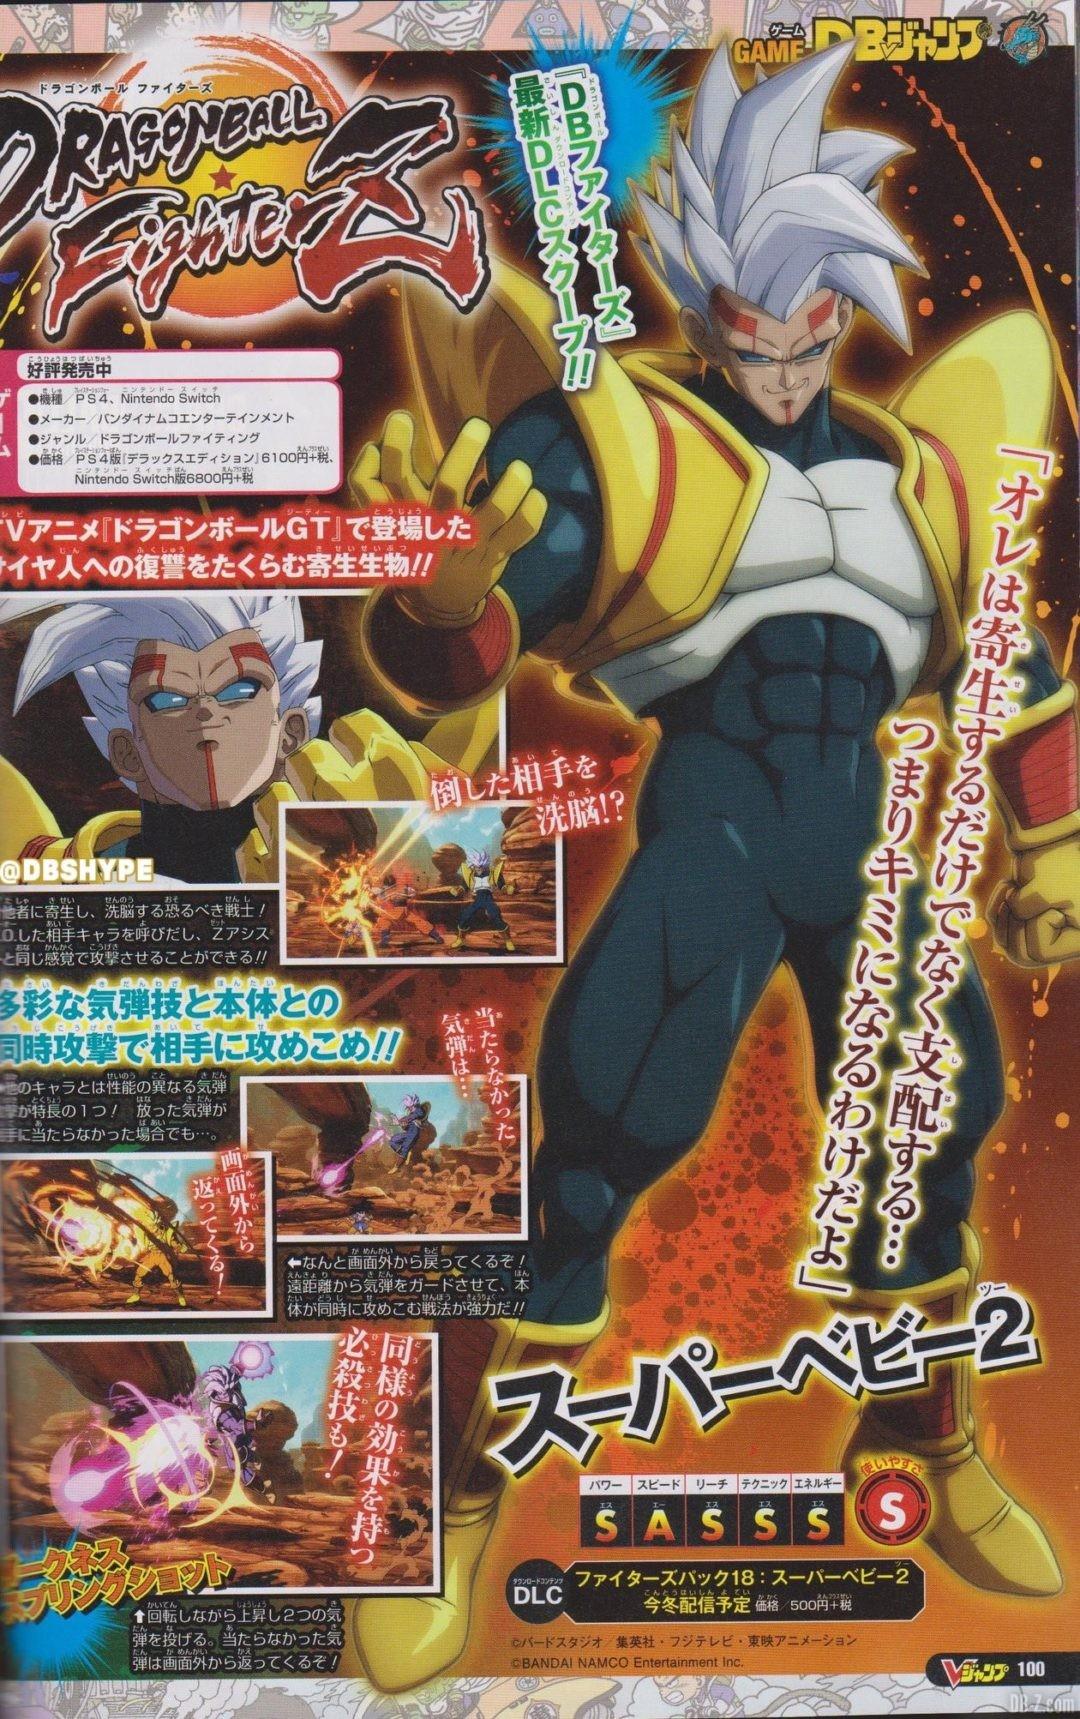 V Jump 21.12.2020 Dragon Ball FighterZ Super Baby 2 2